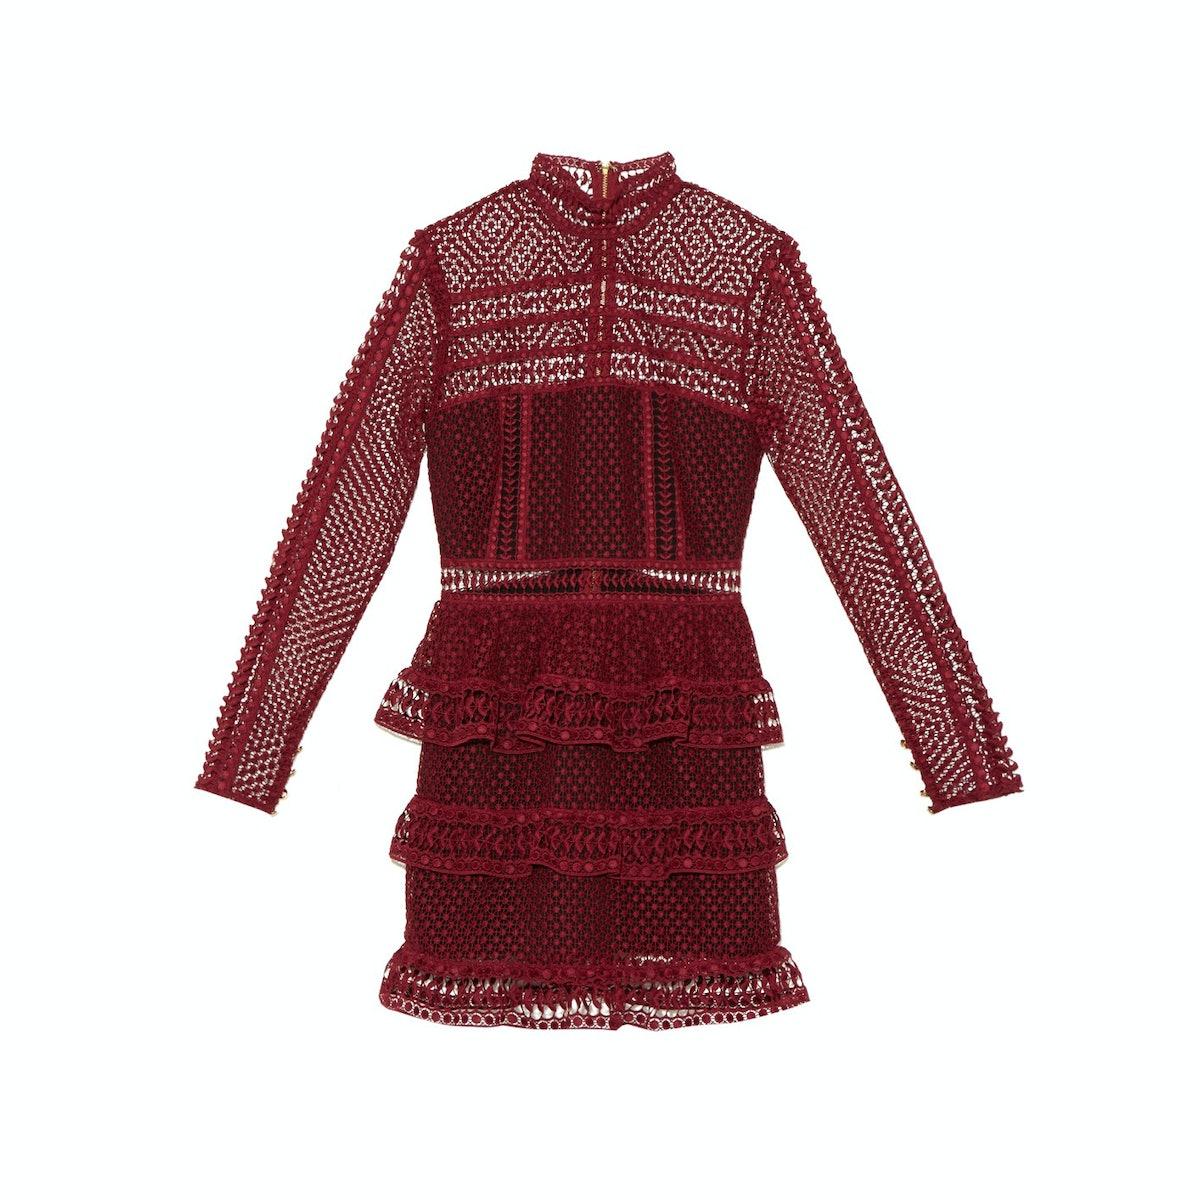 Self-Portrait-mini-dress,-$366,-matchesfashion.com